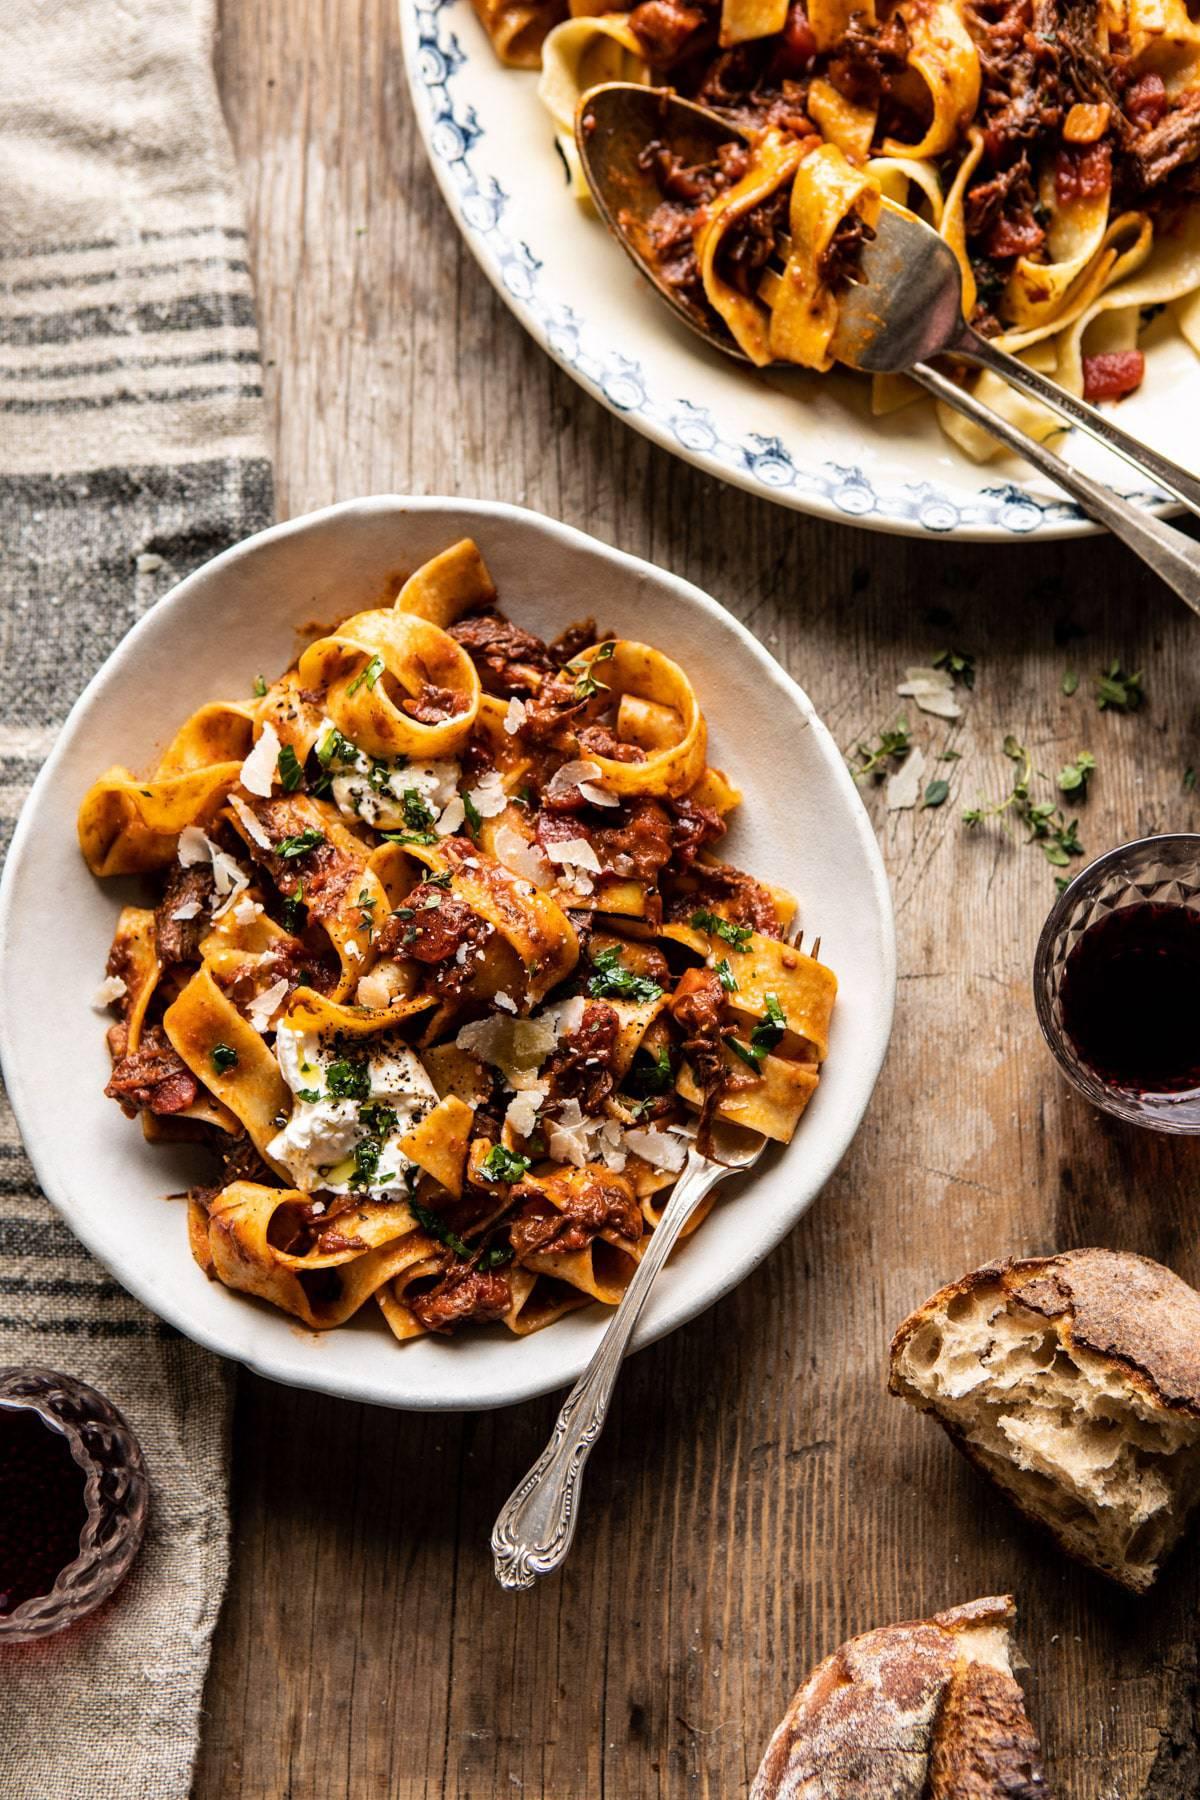 Slow Cooker Red Wine Sunday Ragu Pasta   halfbakedharvest.com #pasta #ragu #Italian #slowcooker #crockpot #instantpot